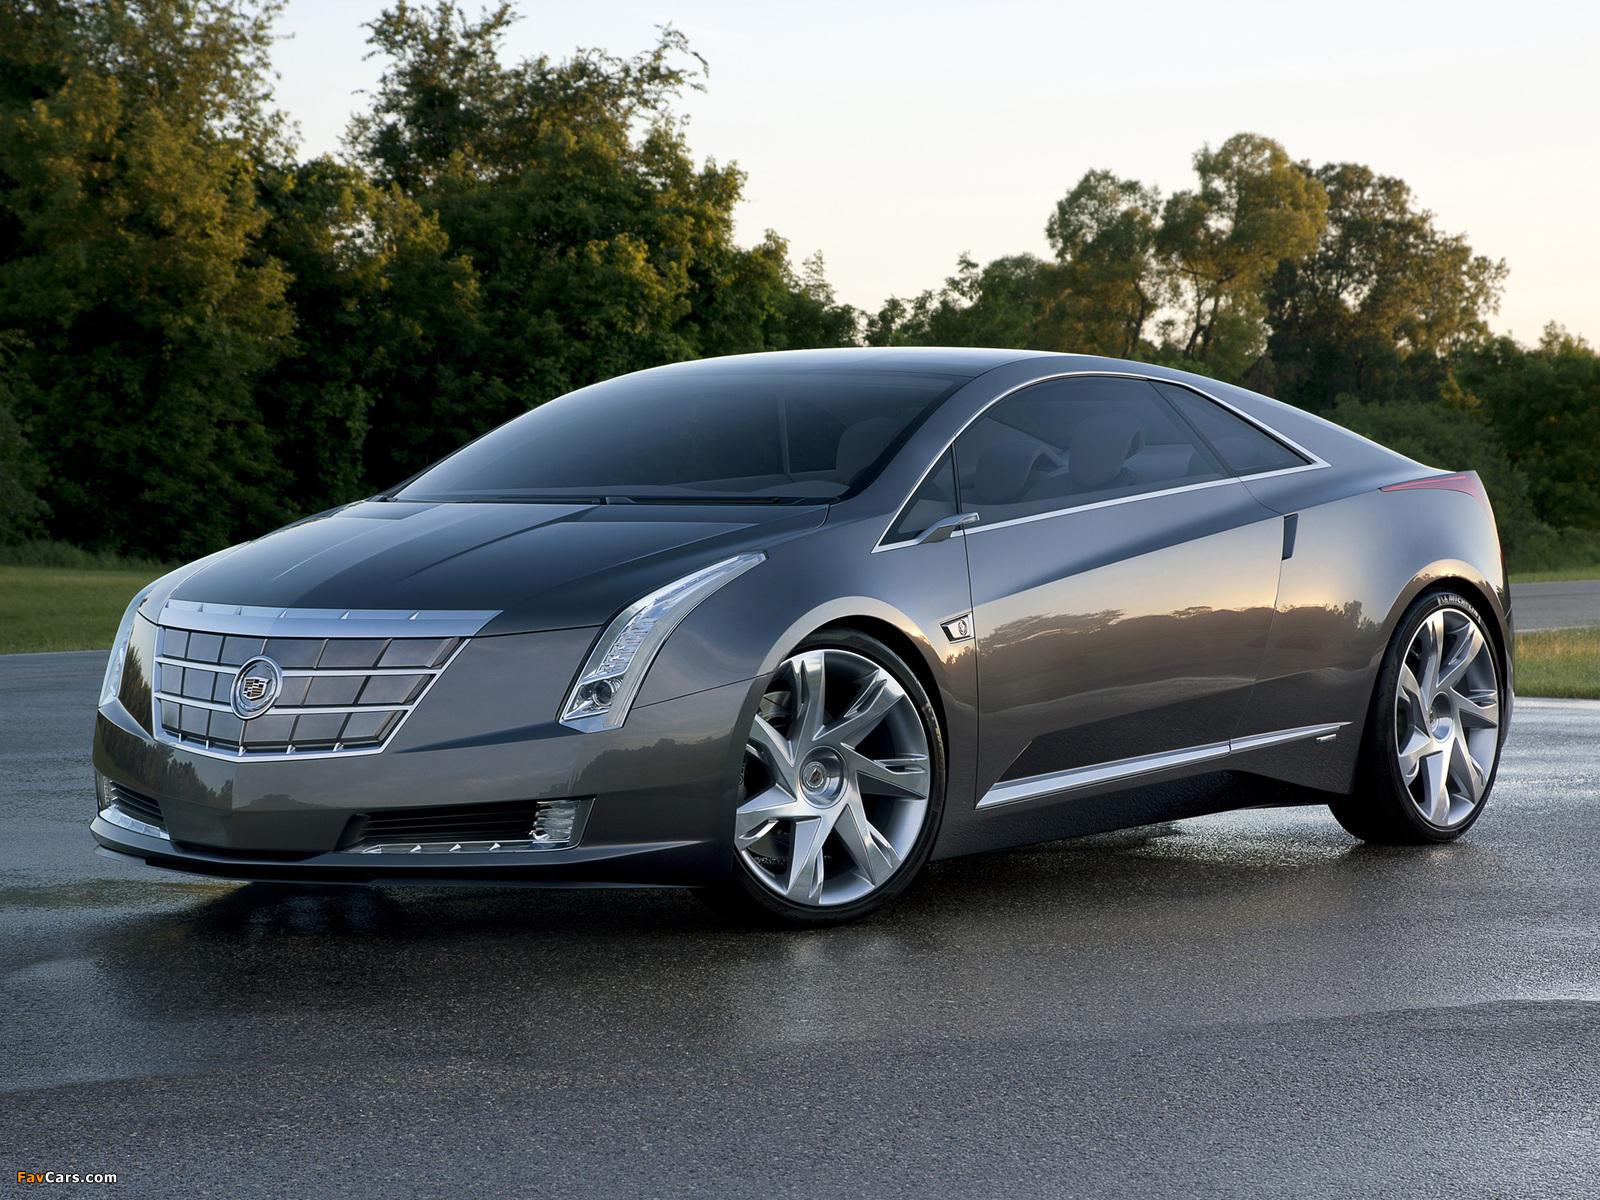 Cadillac Converj Concept 2009 pictures (1600 x 1200)